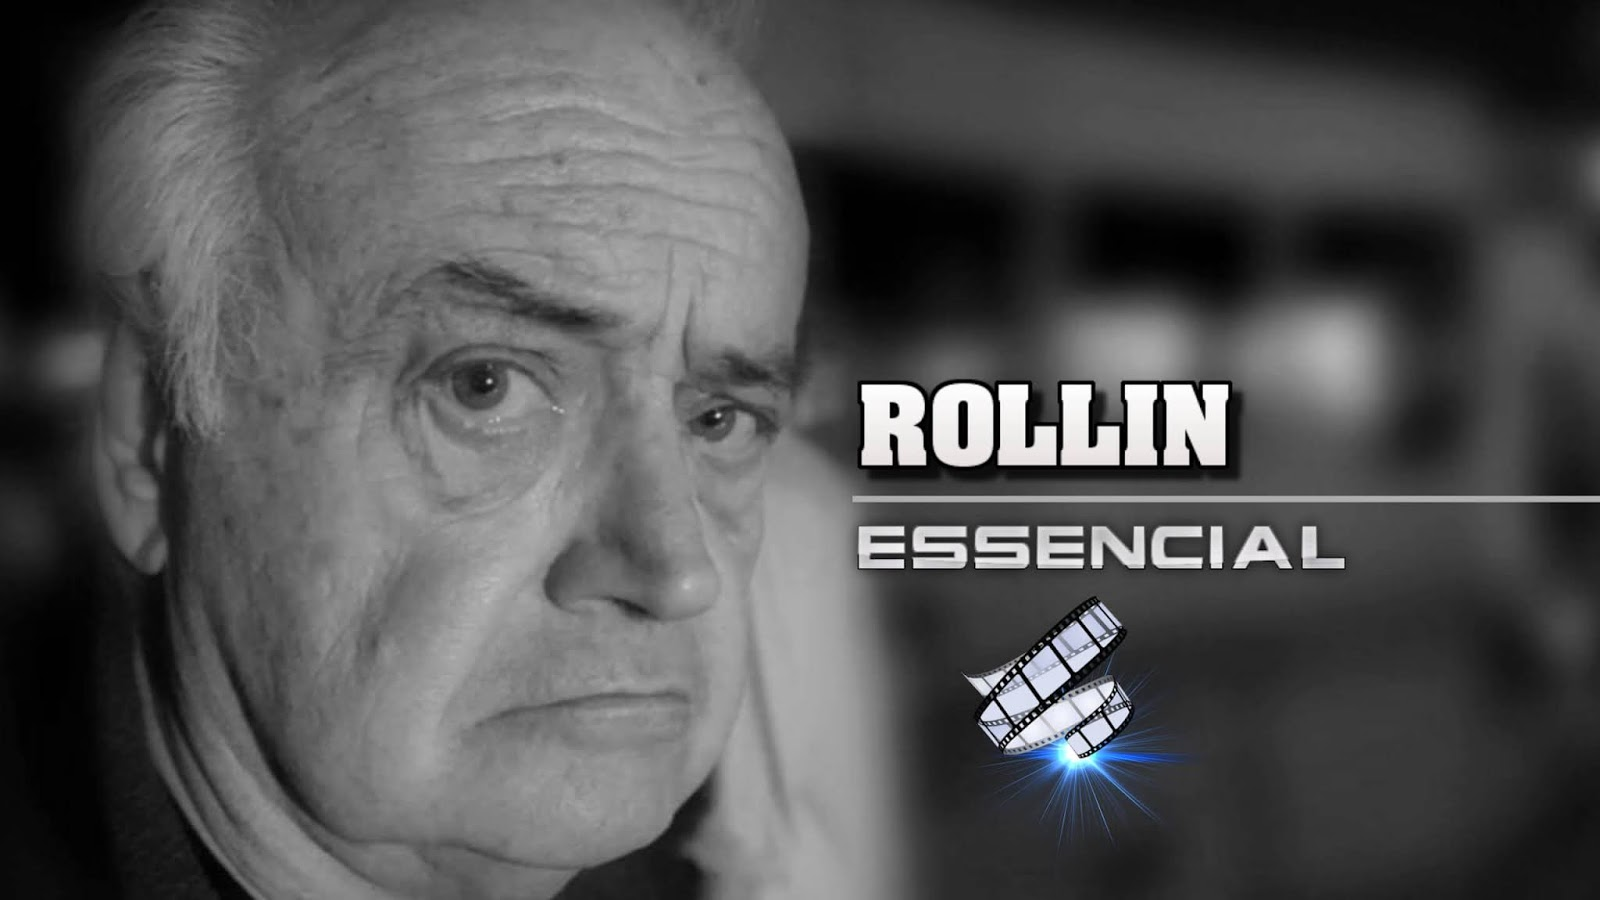 jean-rollin-10-filmes-essenciais